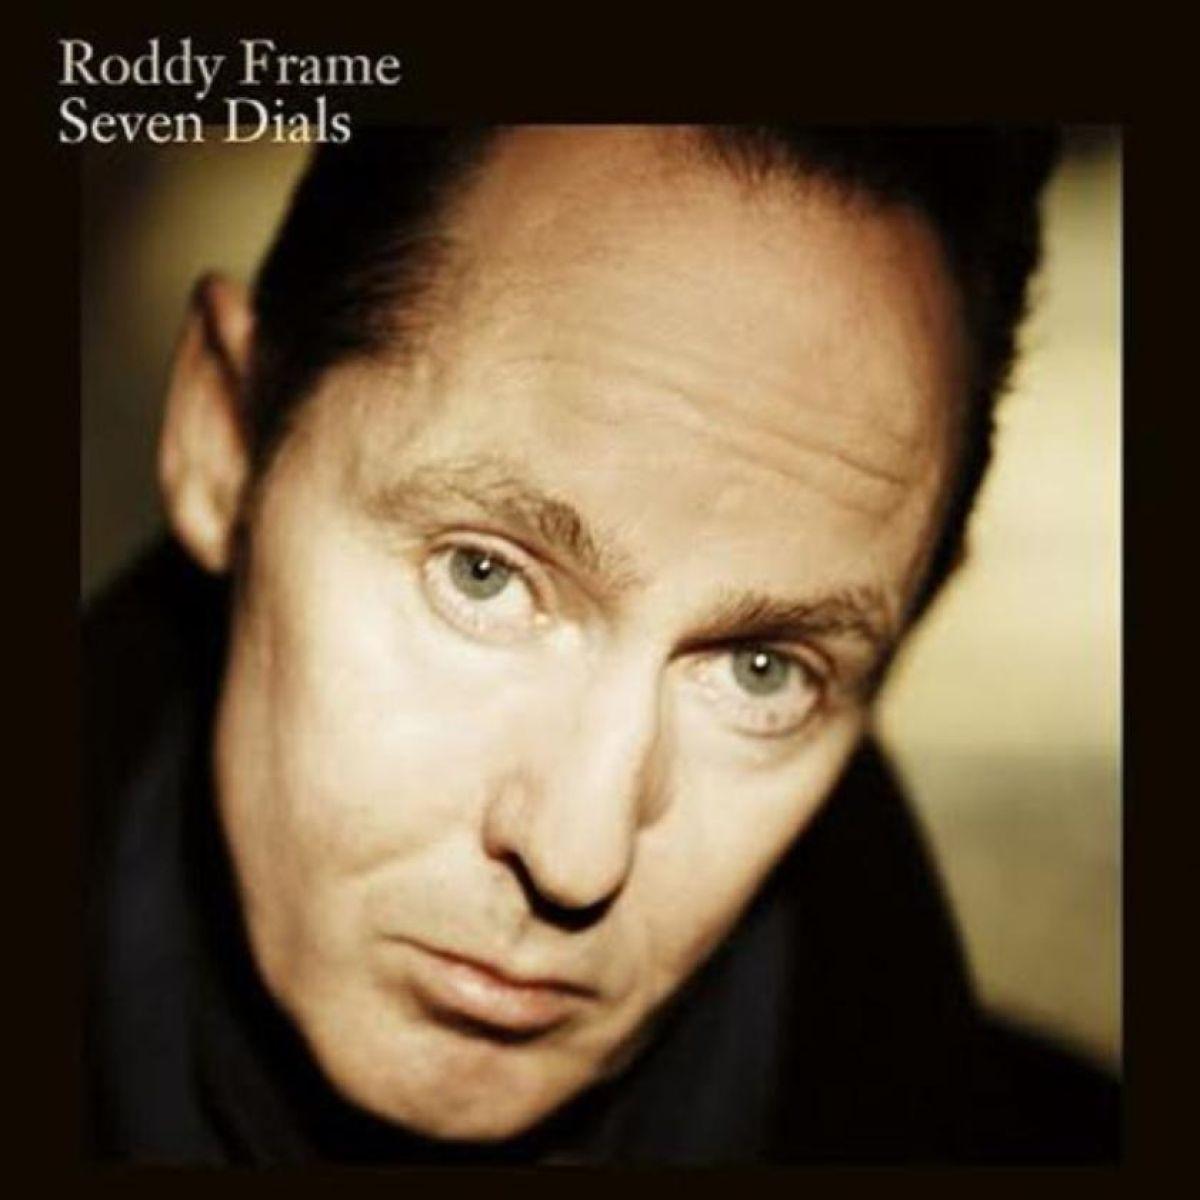 Roddy Frame: Seven Dials